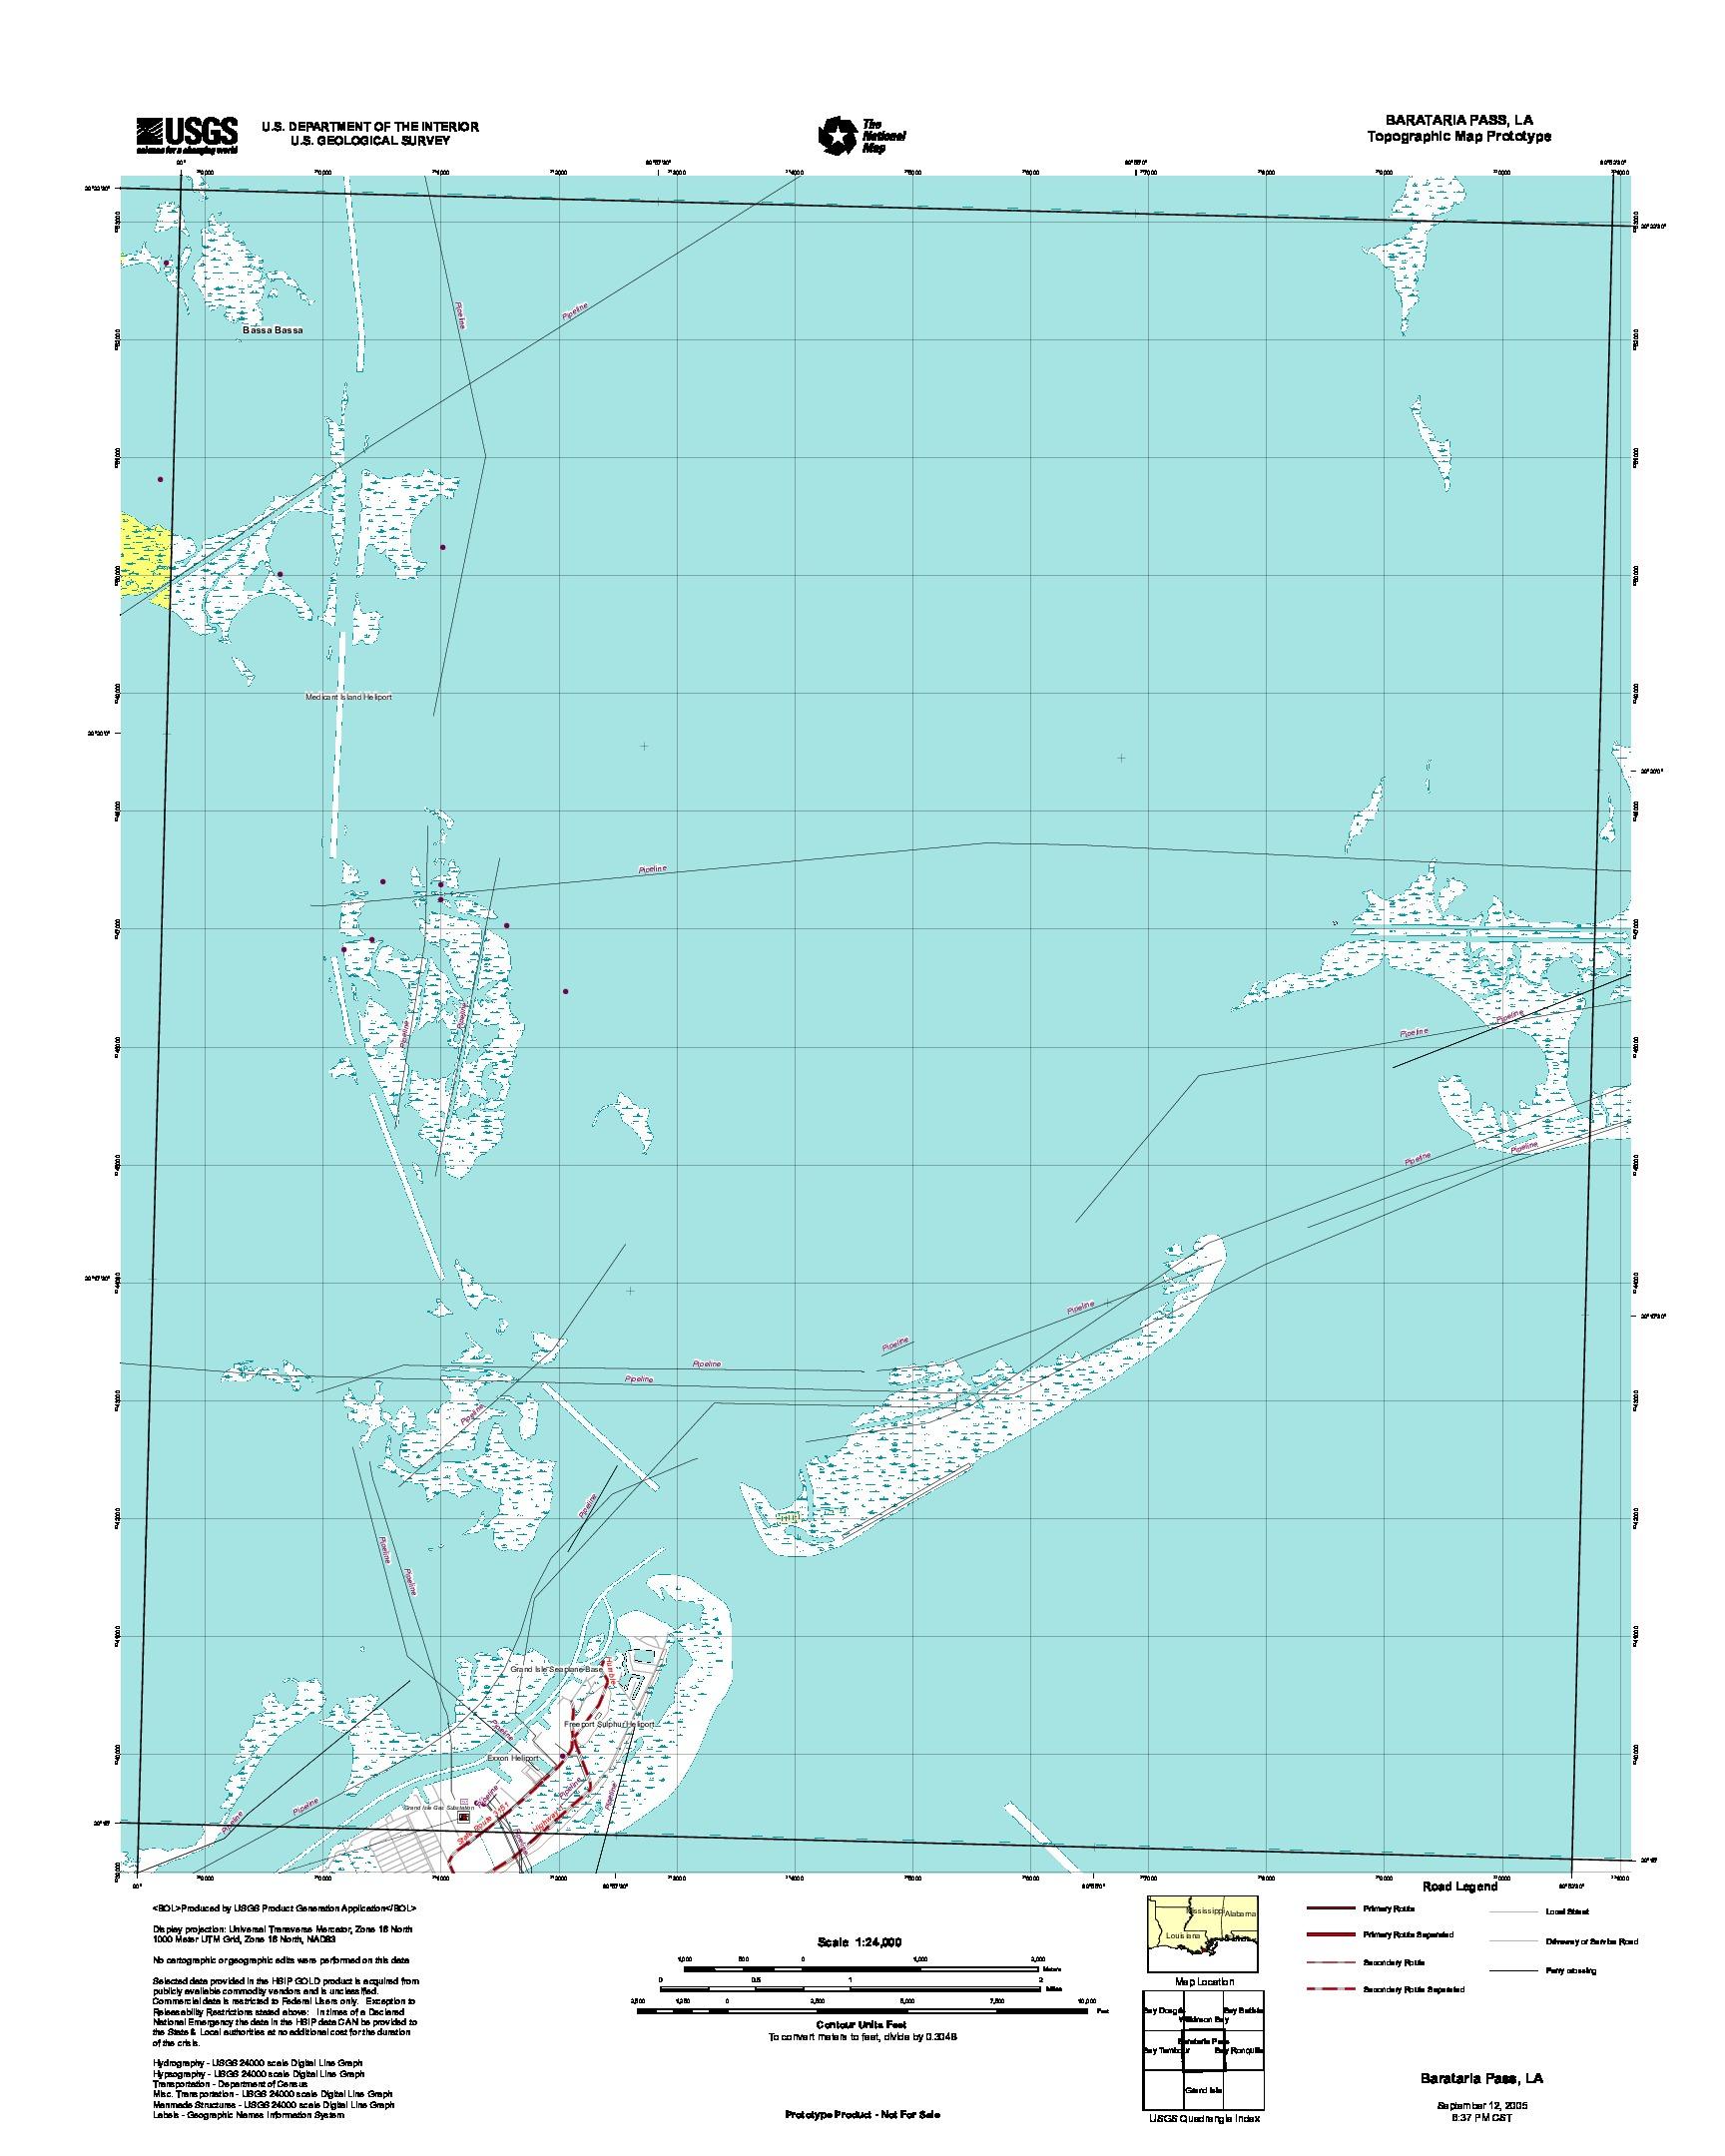 Barataria Pass, Topographic Map Prototype, Louisiana, United States, September 12, 2005